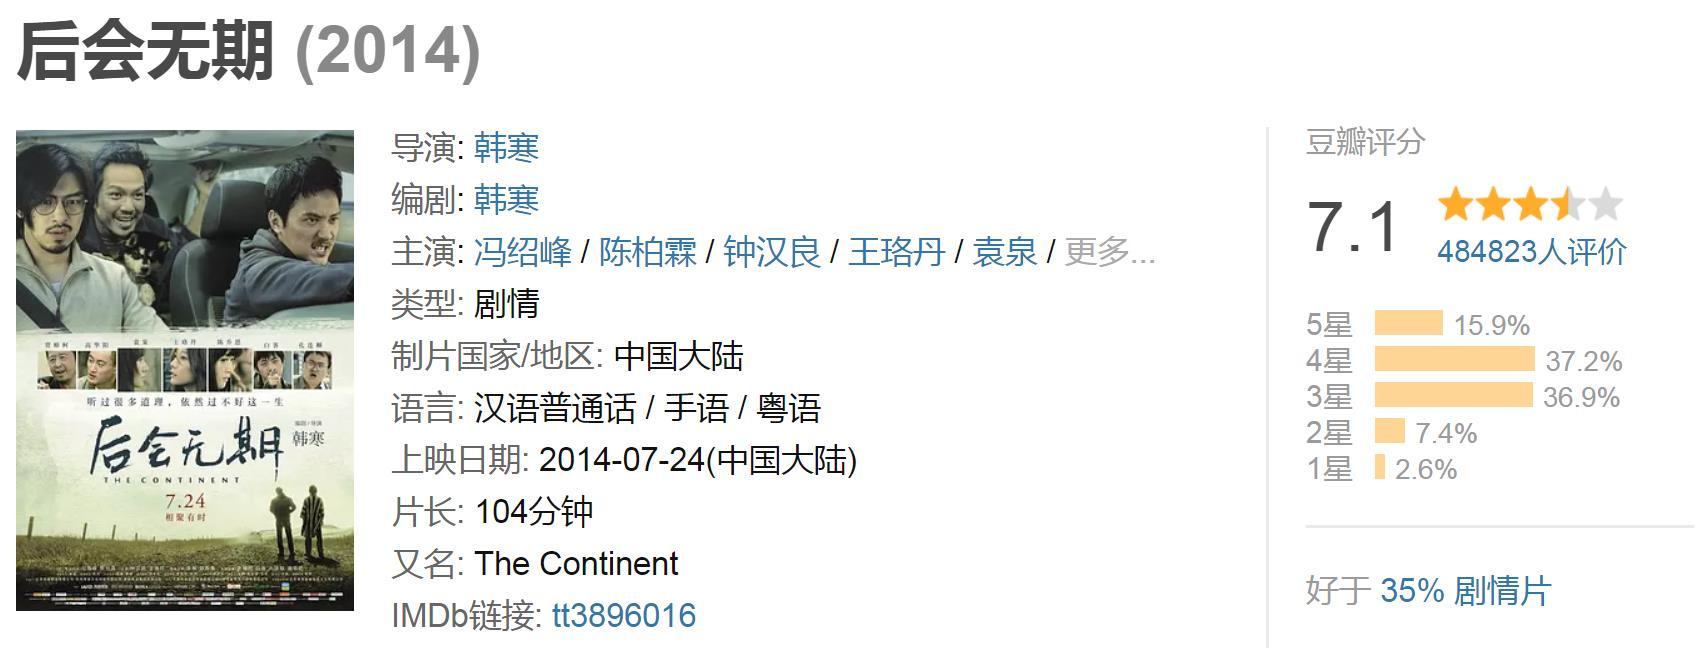 QQ浏览器截图20190819142727.jpg